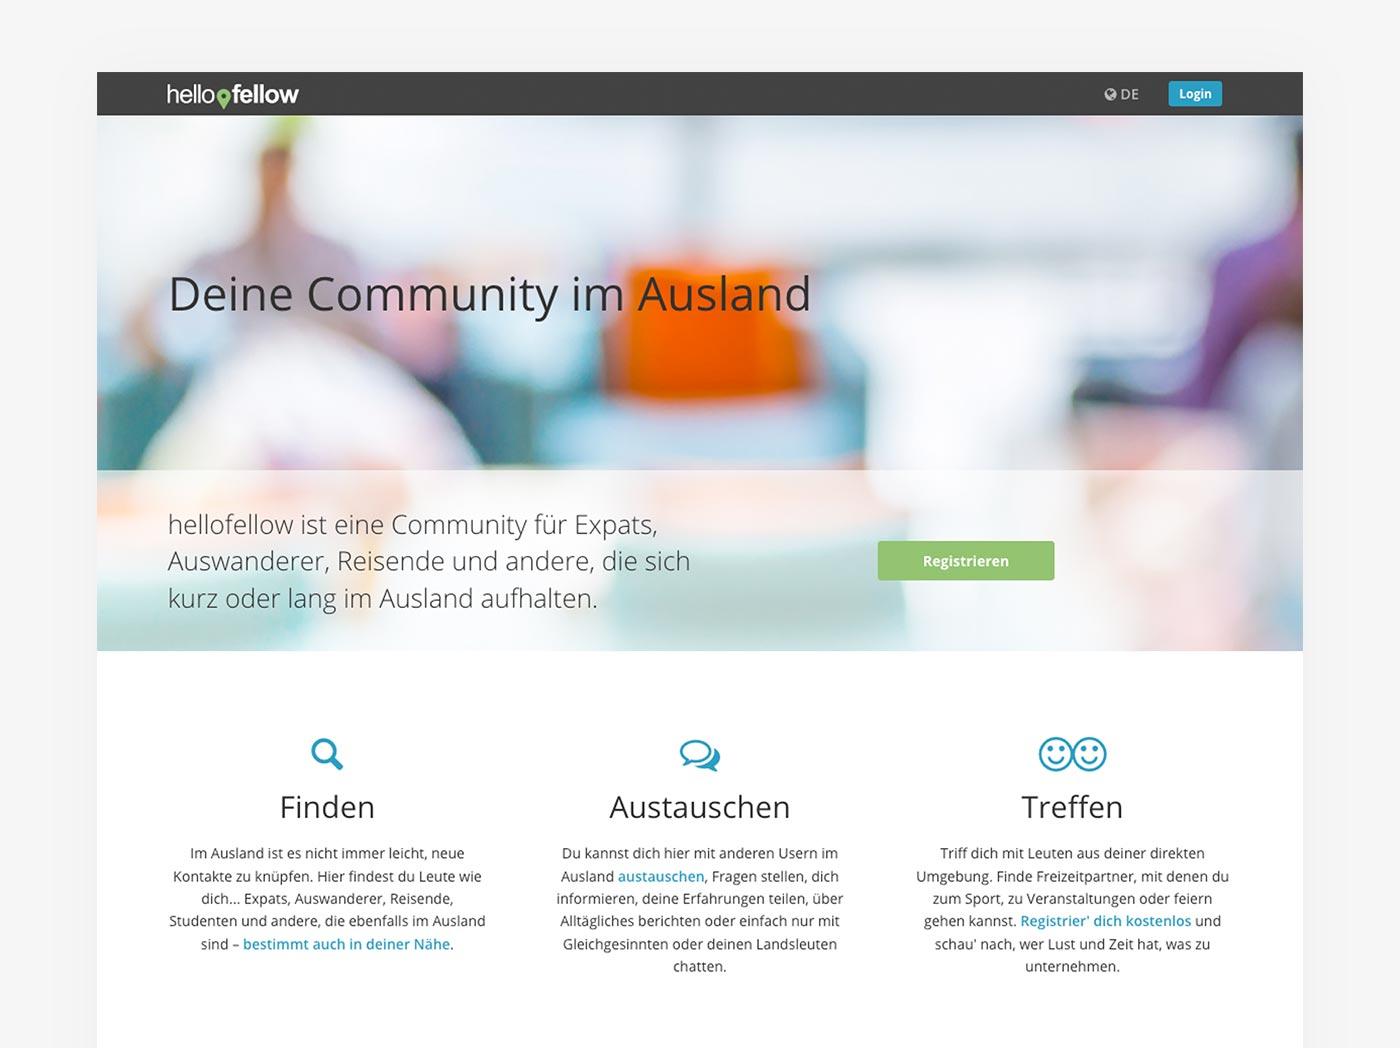 Social Community hellofellow.com